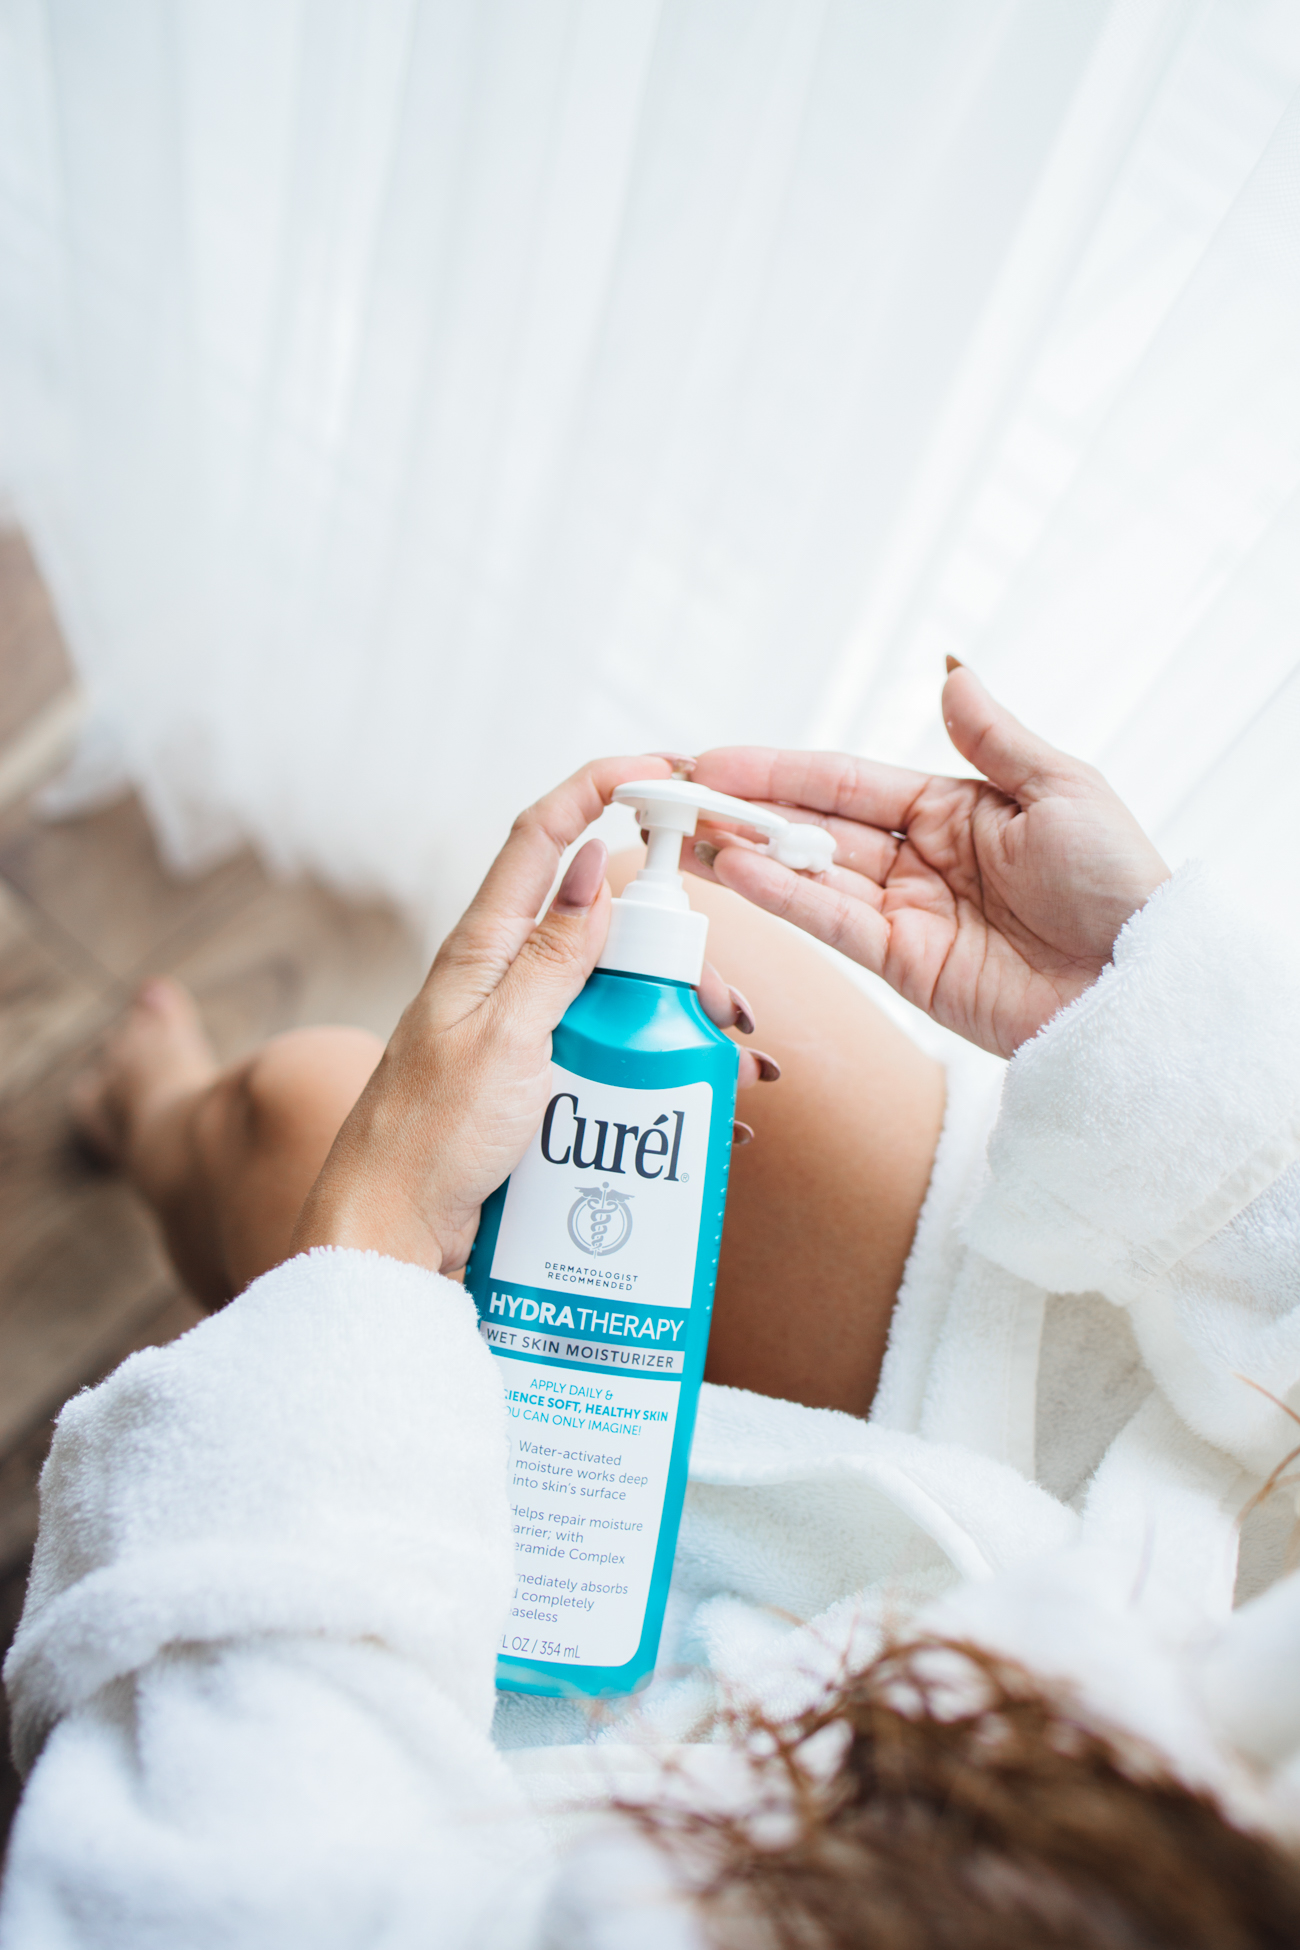 Curel Hydra Therapy Moisturizer